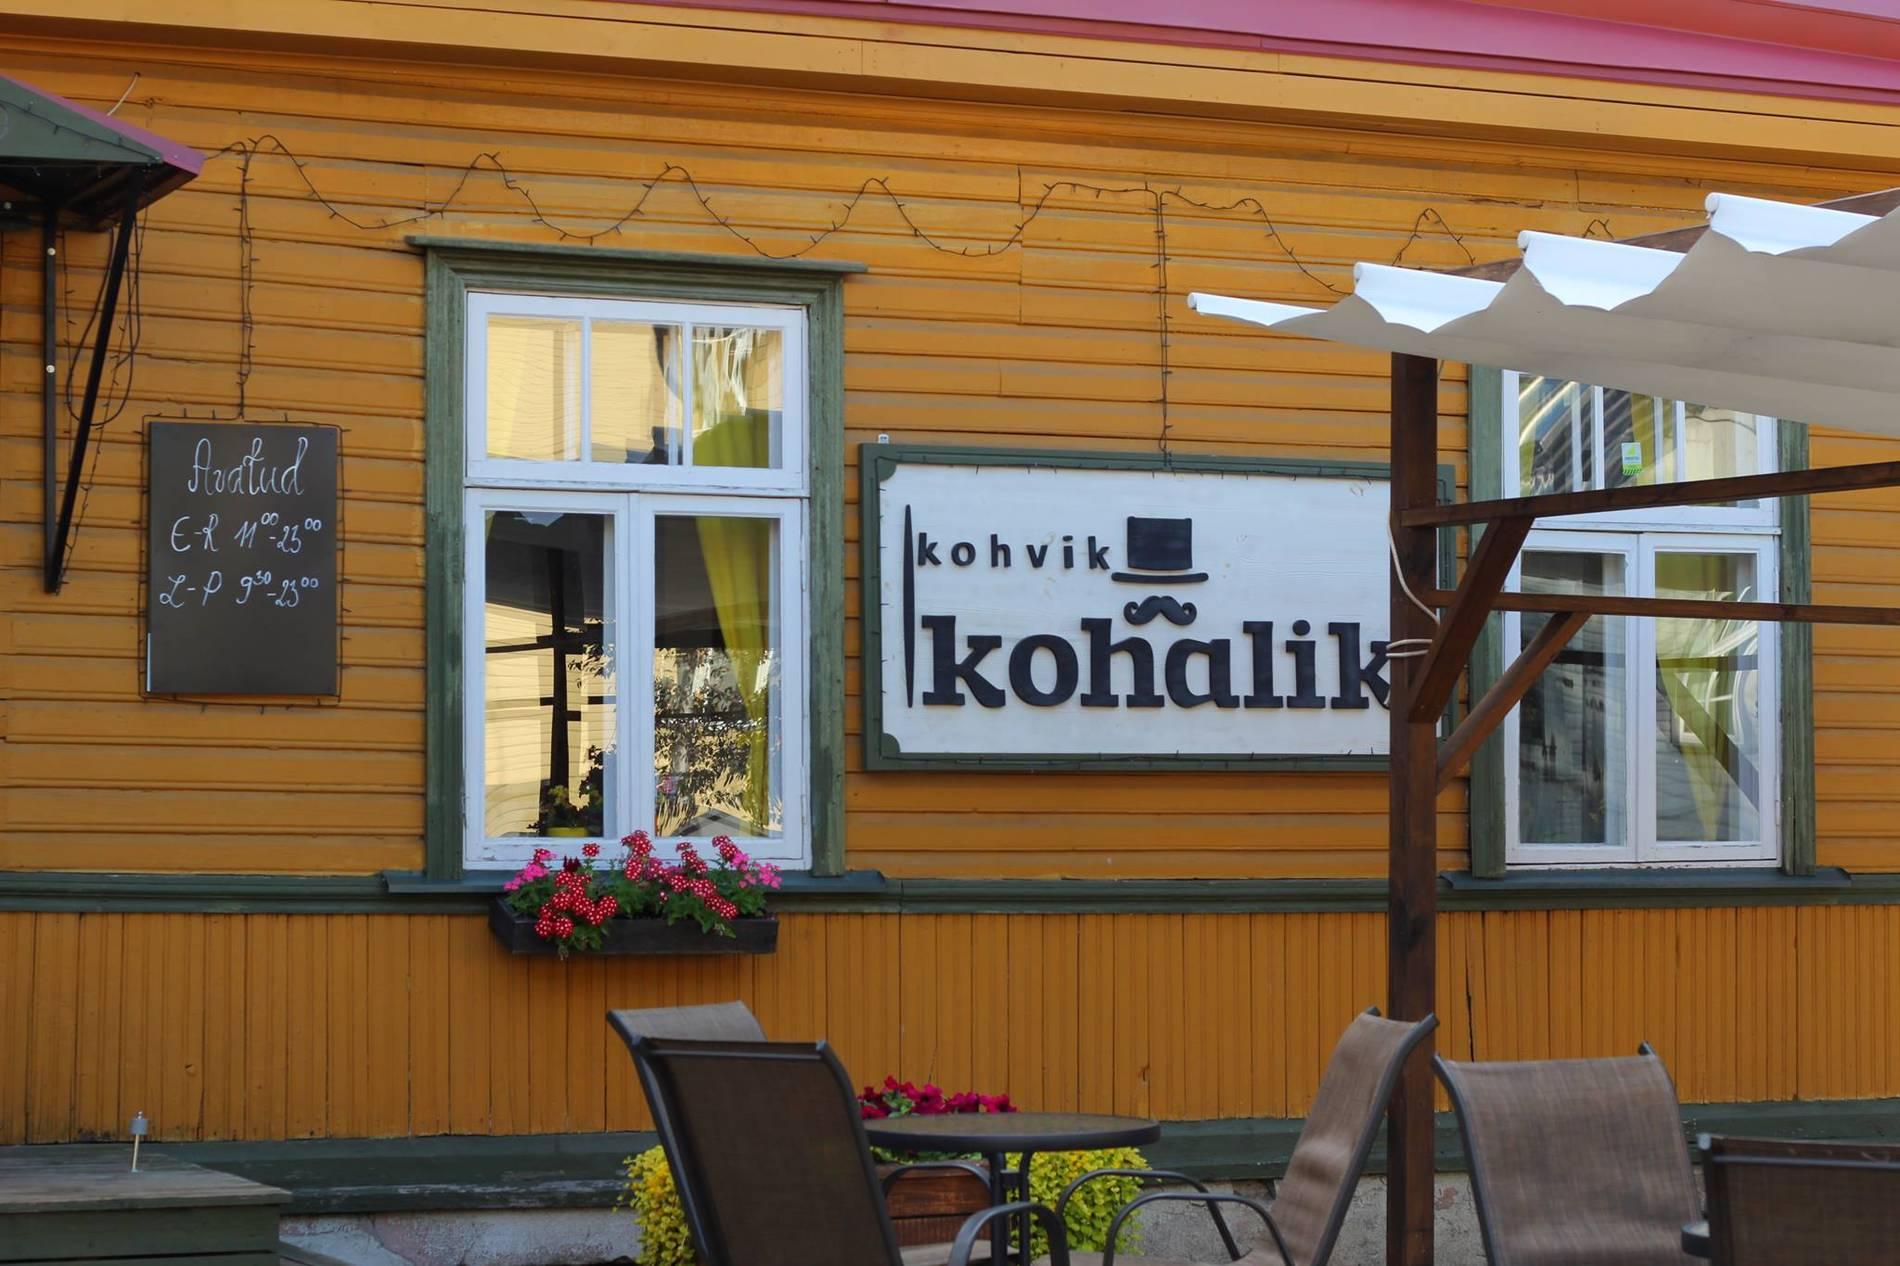 External view of the Kohalik restaurant in Tallinn, Estonia.